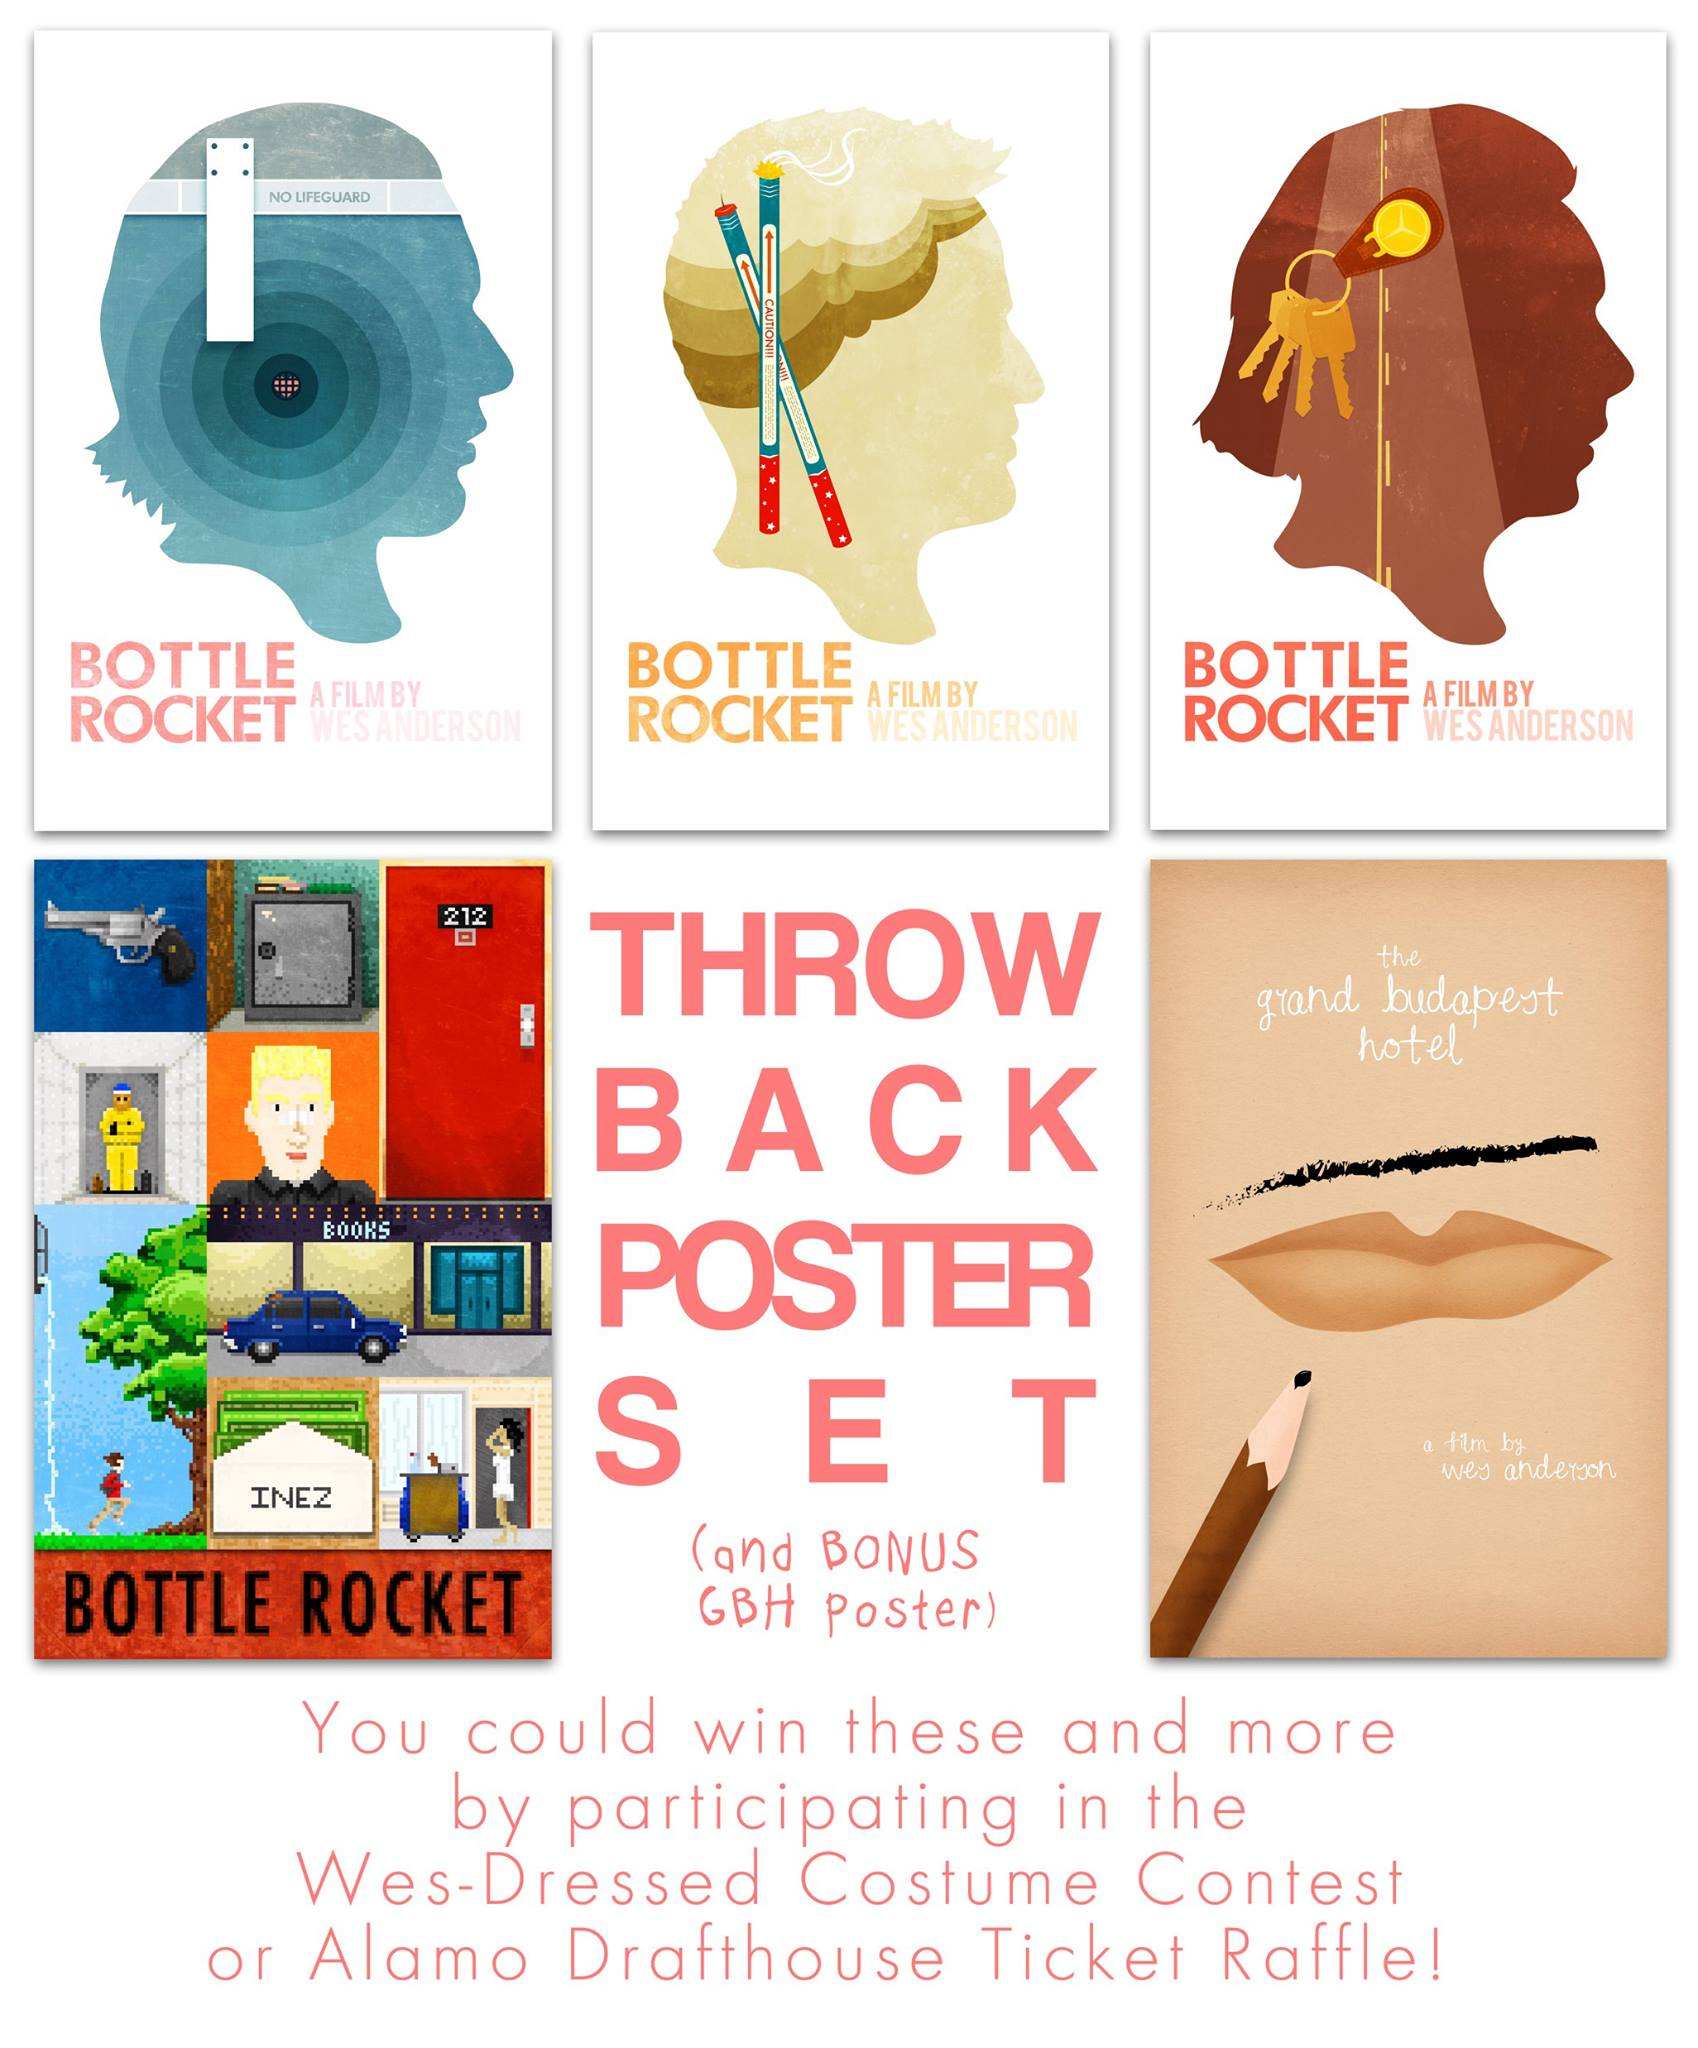 Throw Back Poster set for Wes Dressed Costume Contest - Winner Teresa Powell